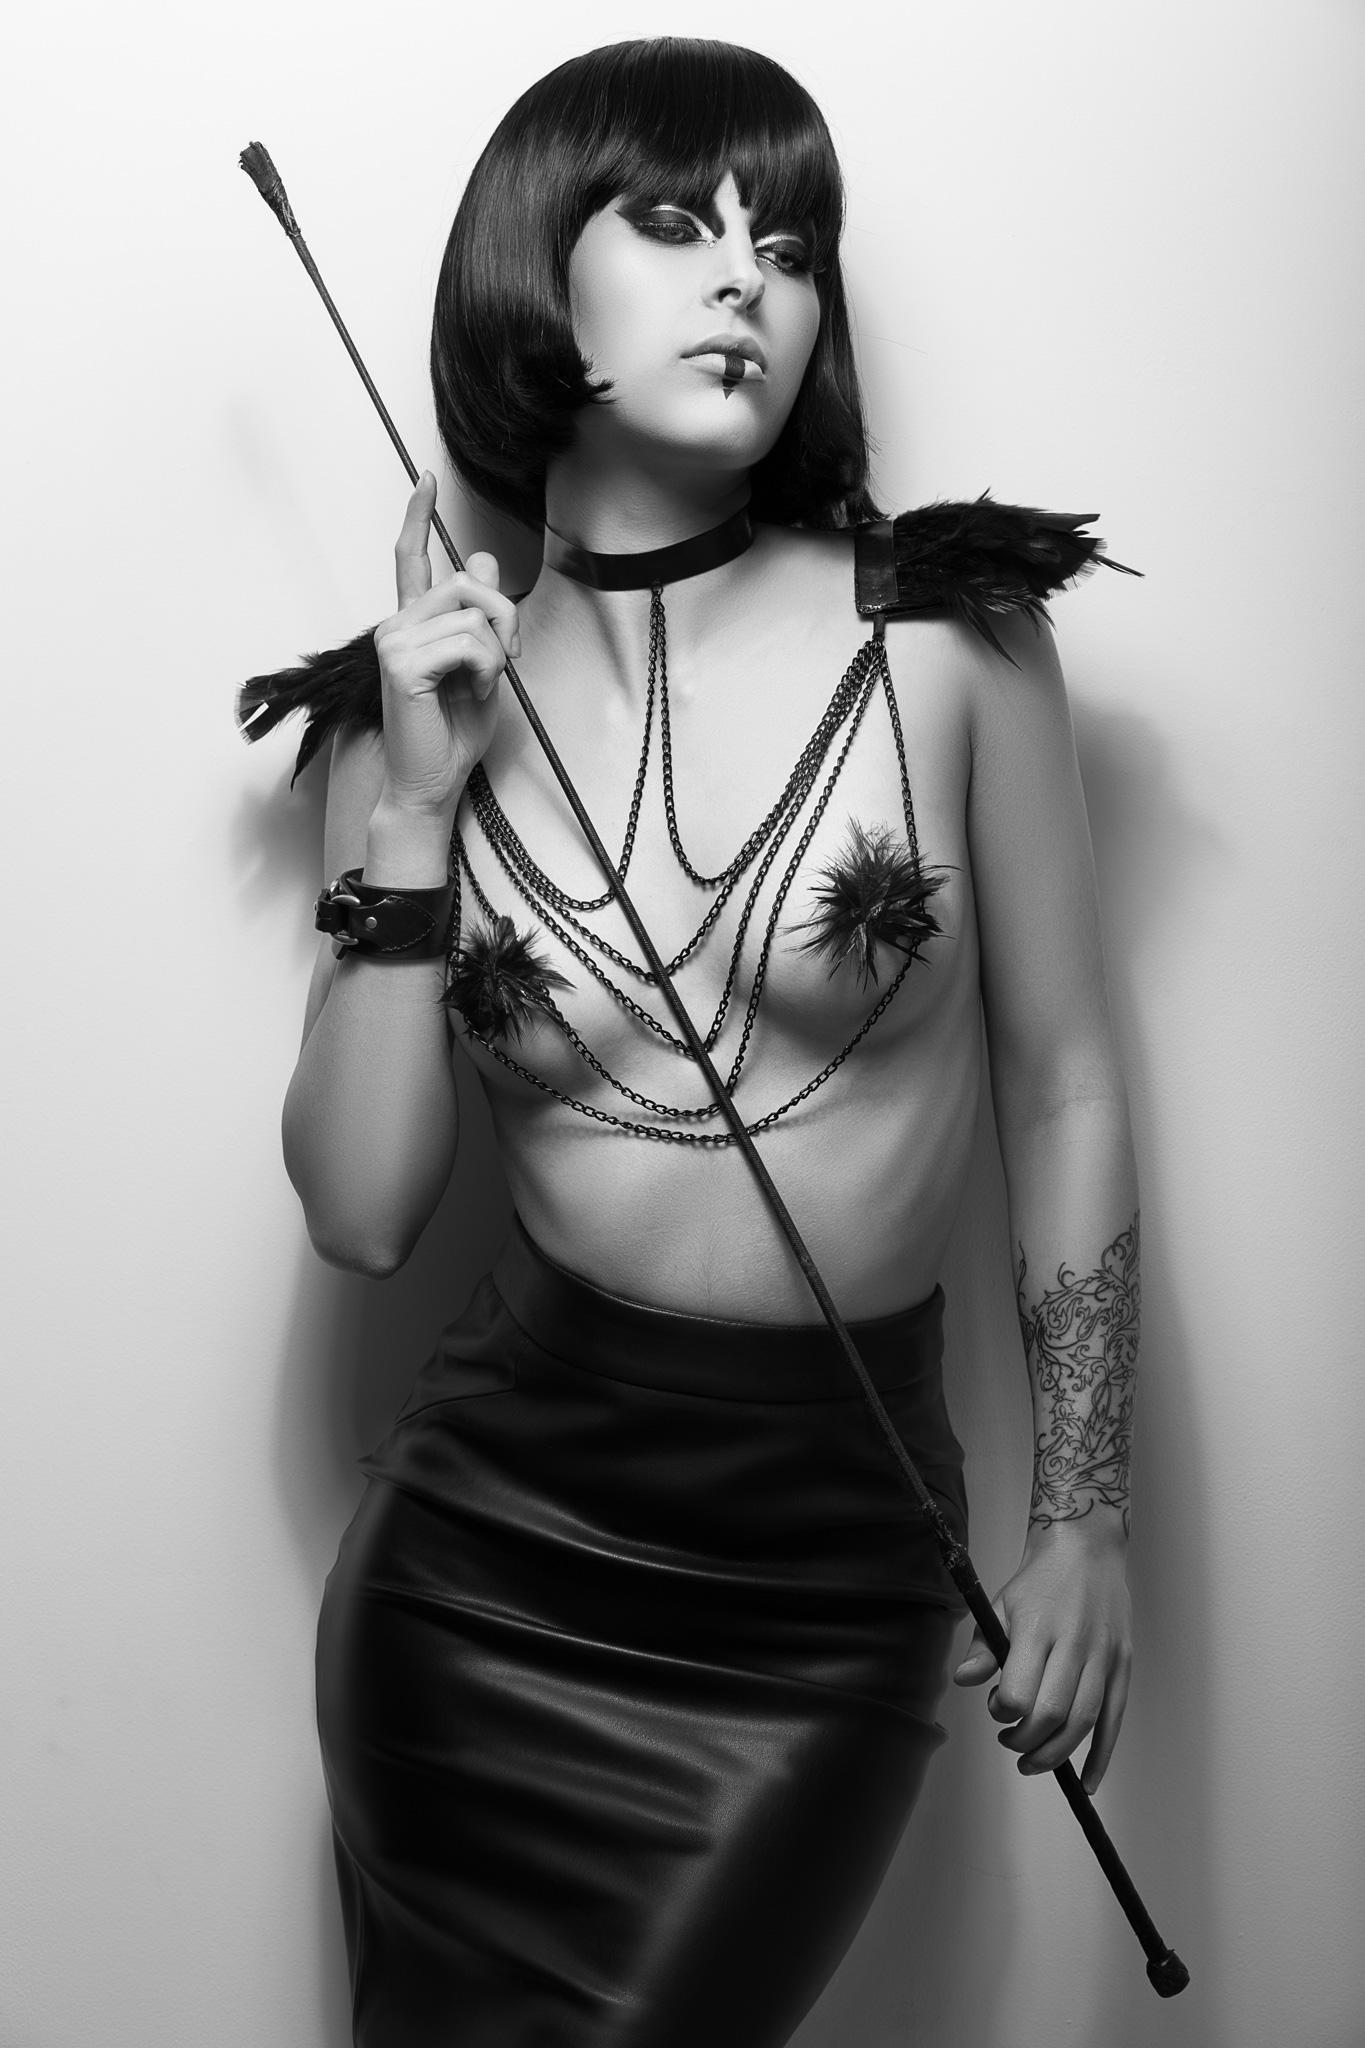 Mistress  Modèle : Jessica Gilles / Thana Modèle Make-Up Hair & Stylism : Tokyo Mua Site Web : http://www.vinnyhardy.com